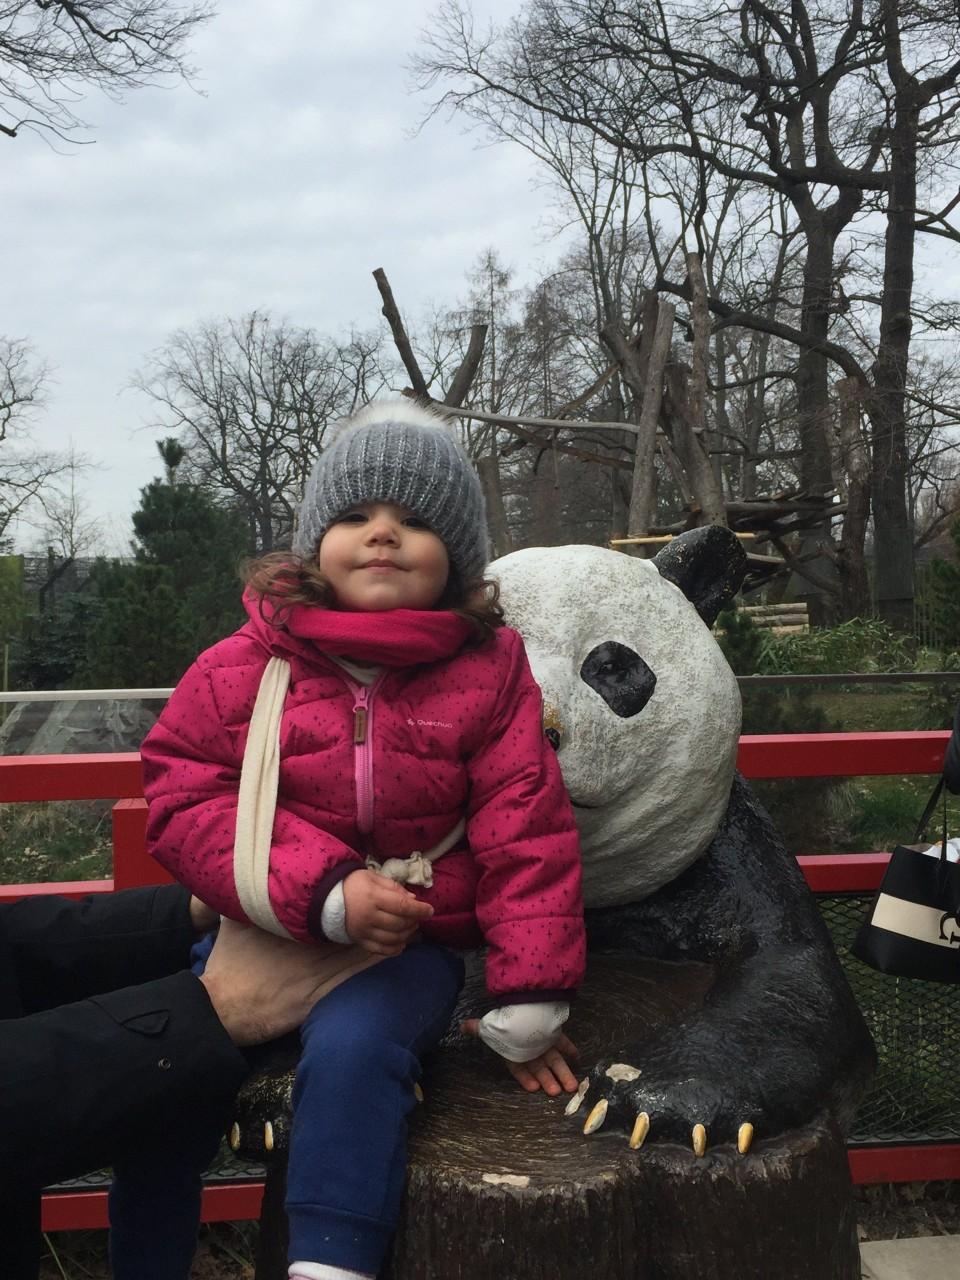 panda garden berlin, visitare lo zoo di berlino